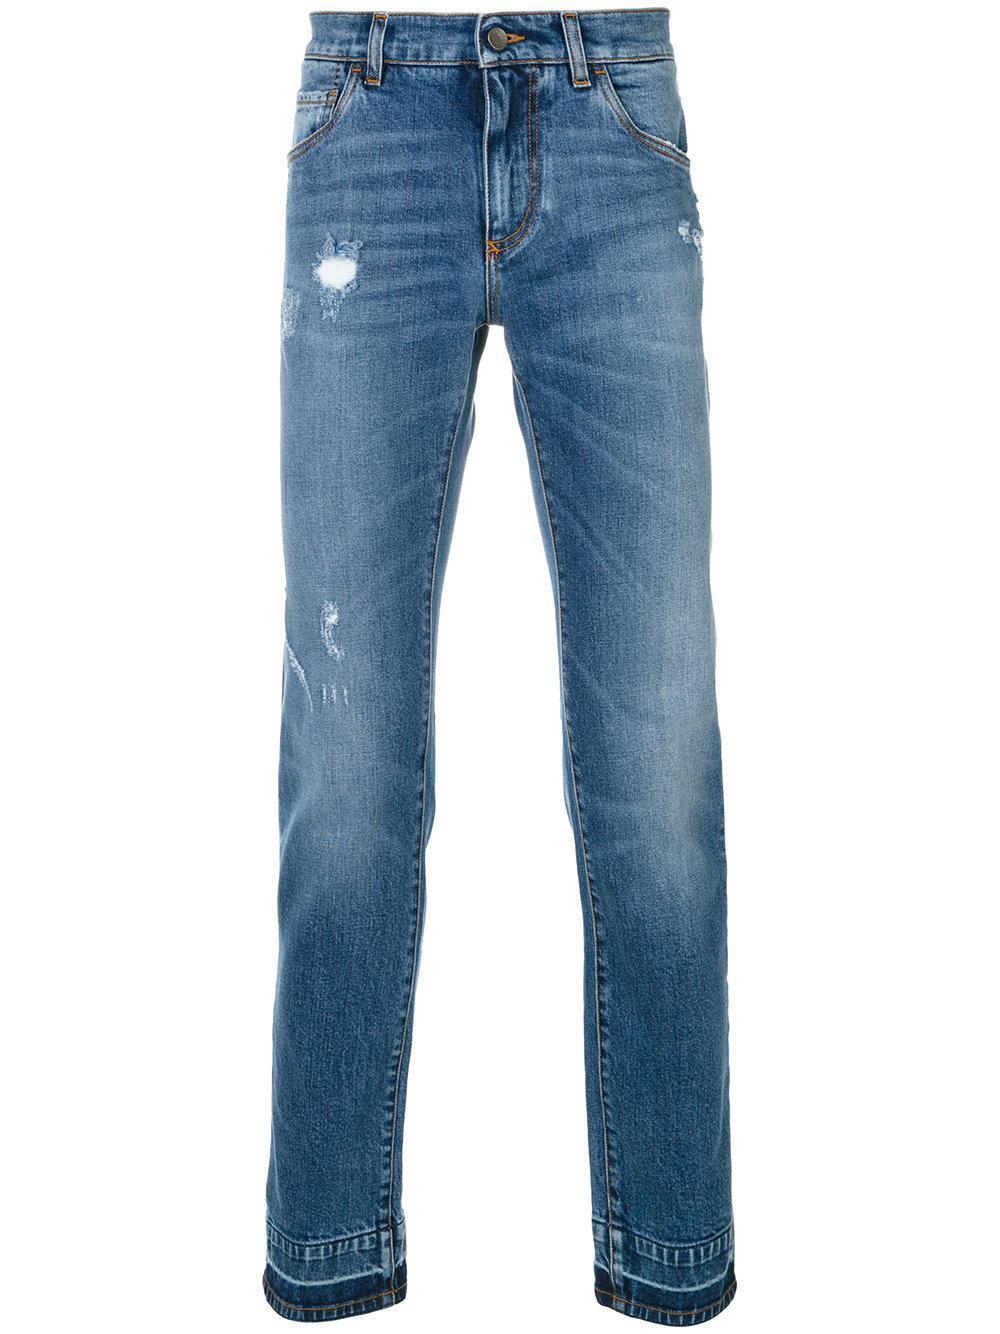 dolce gabbana bootcut jeans in blue for men lyst. Black Bedroom Furniture Sets. Home Design Ideas